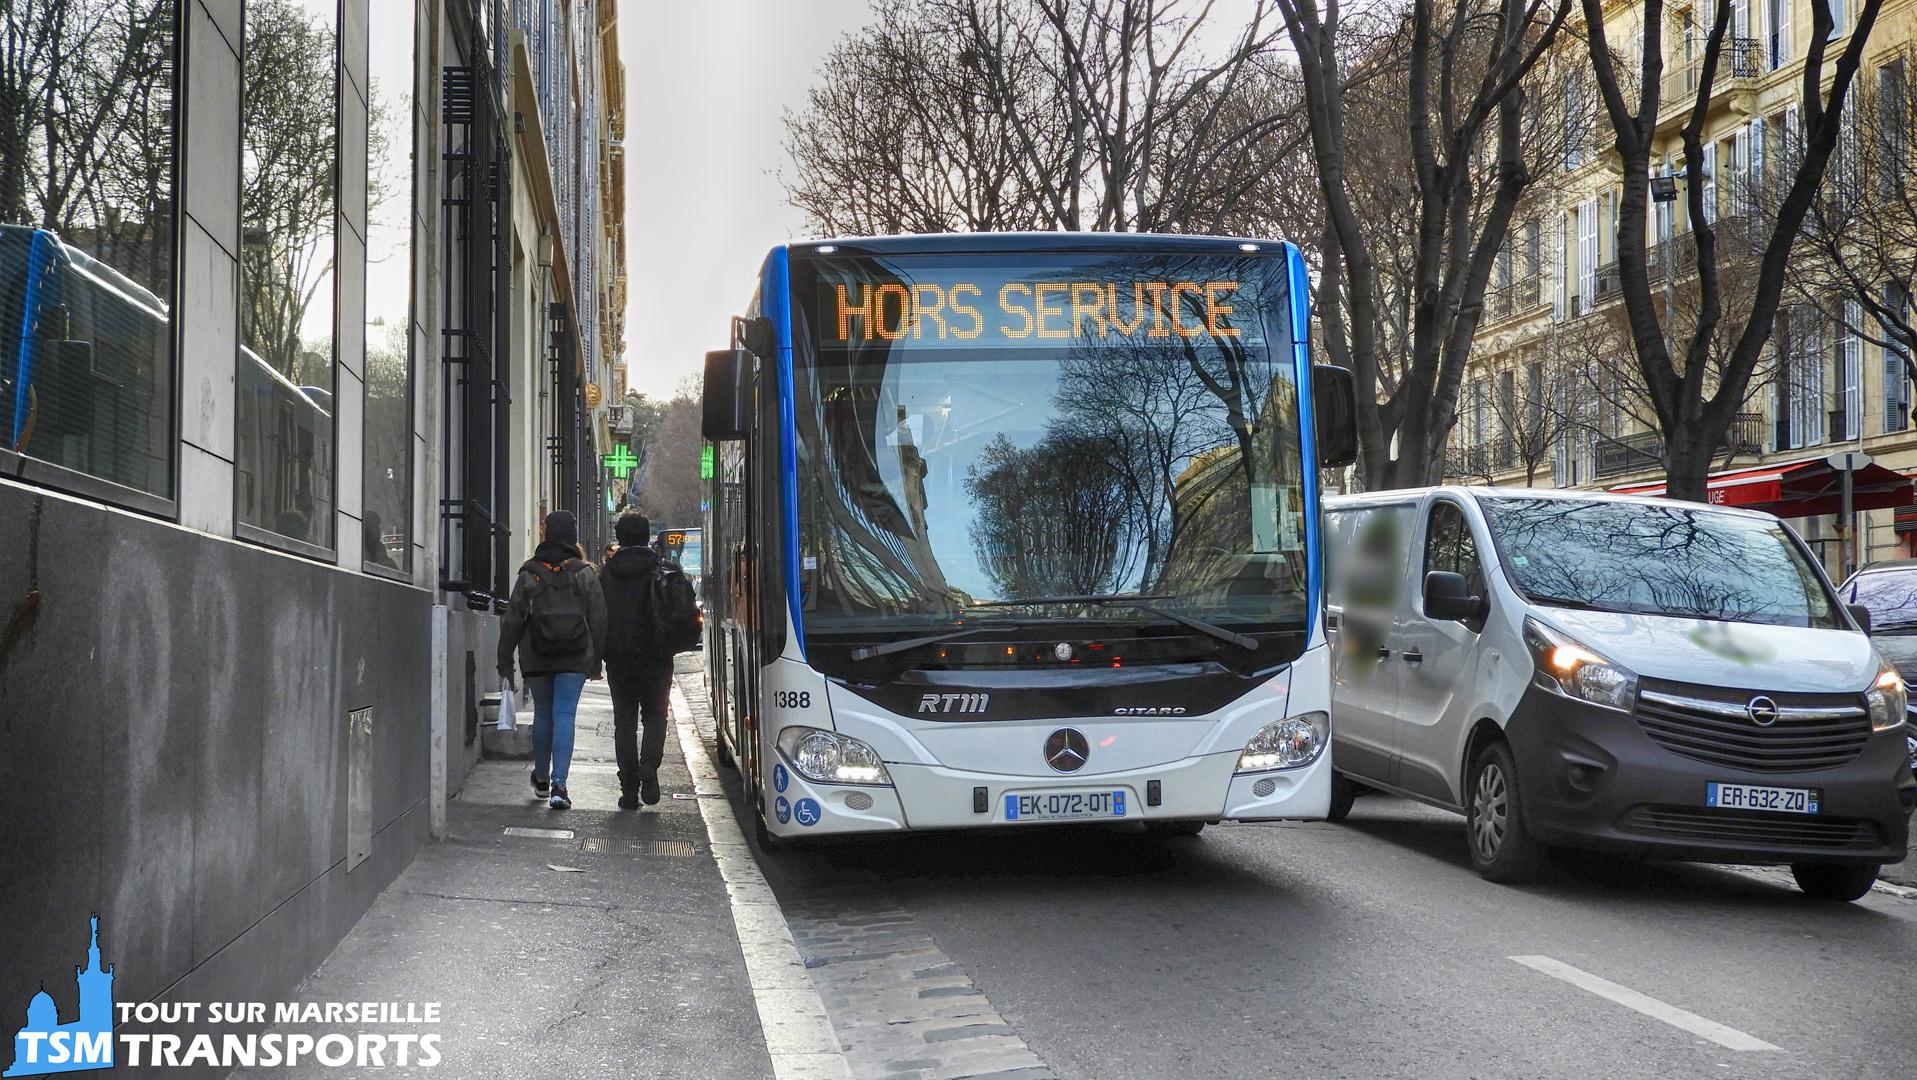 Mercedes Benz Citaro 2 Euro 6 RTM n°1388